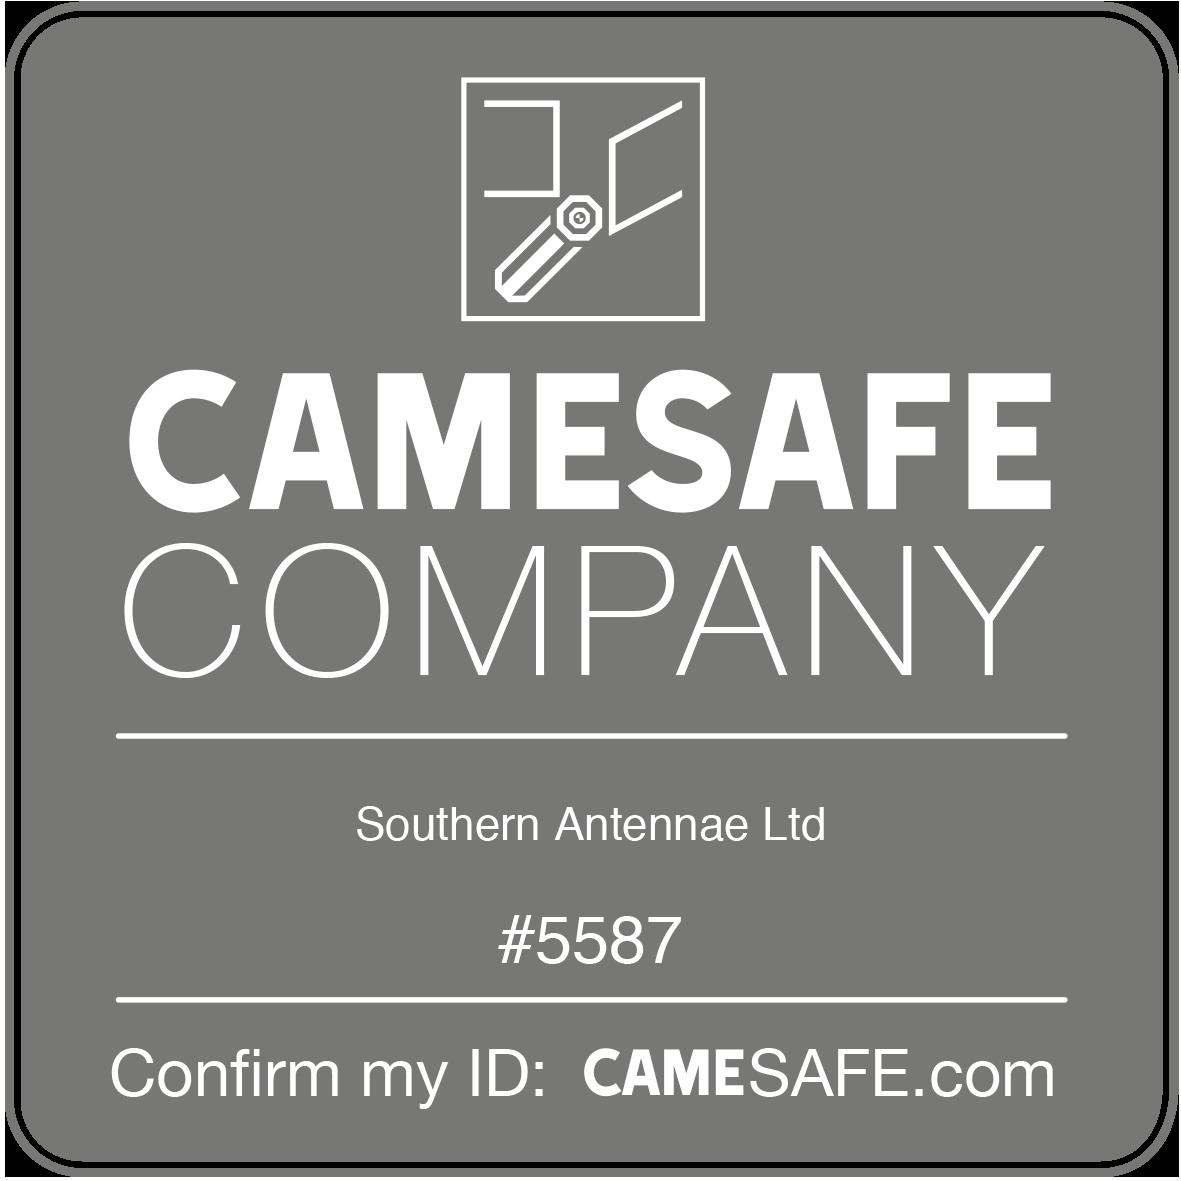 Camesafe company ID.png